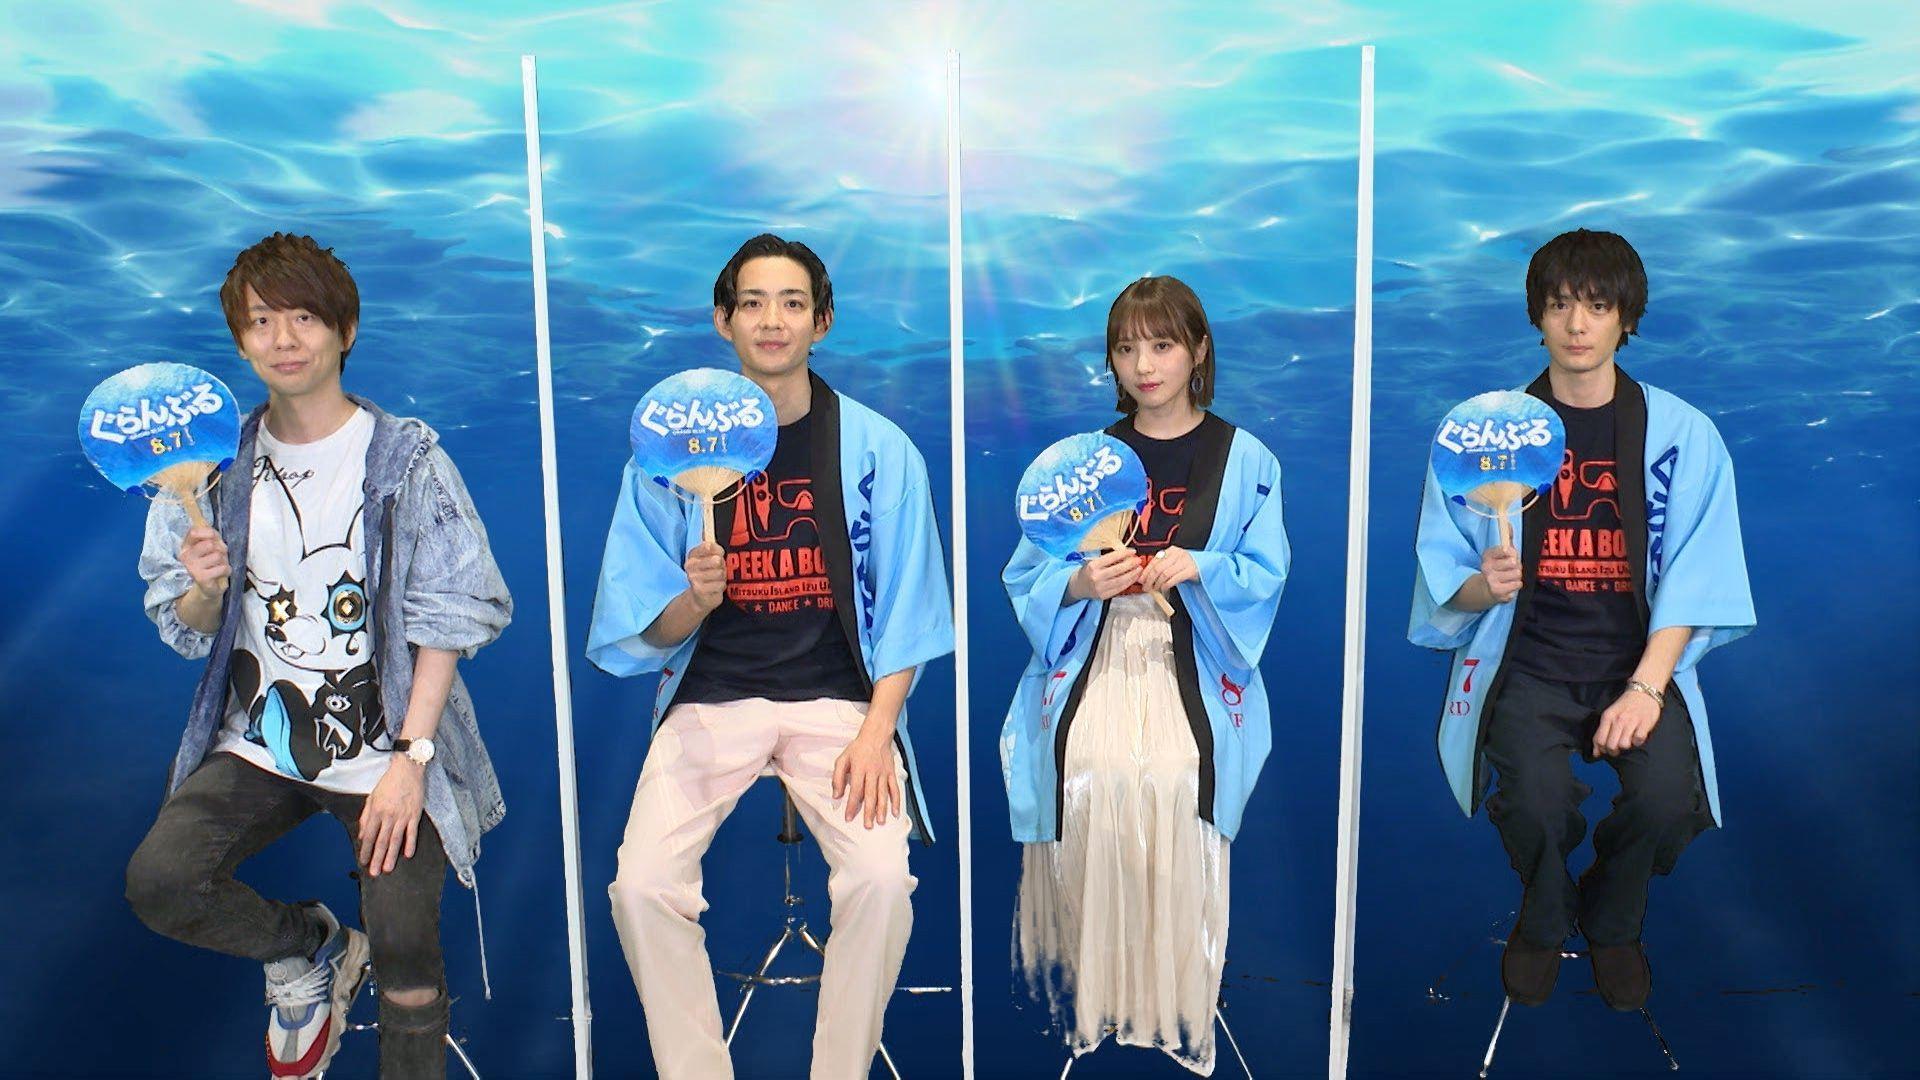 左から、木村良平、竜星涼、乃木坂46与田祐希、犬飼貴丈